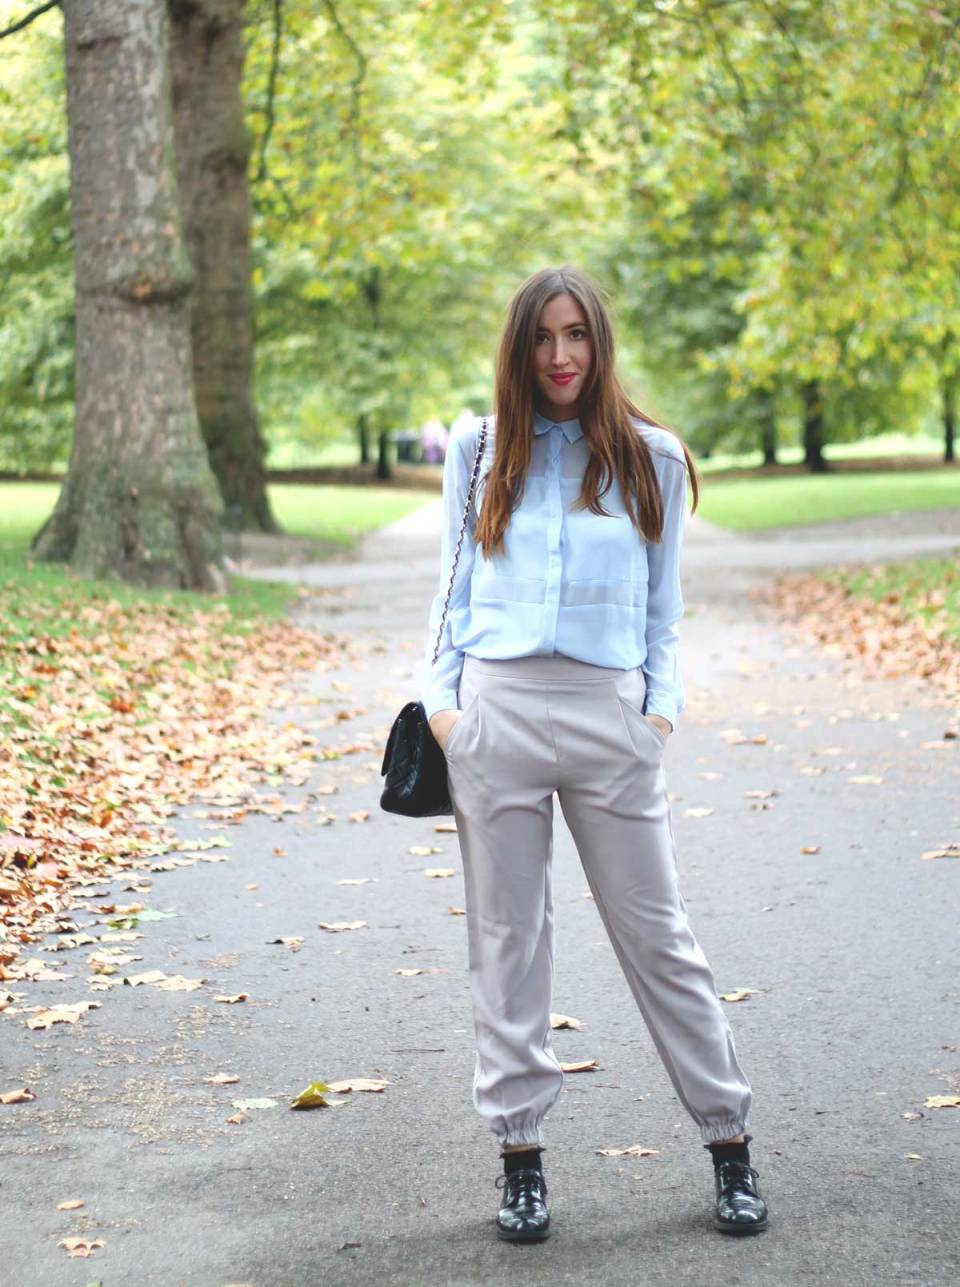 Street-style-3-london-park-elygypset